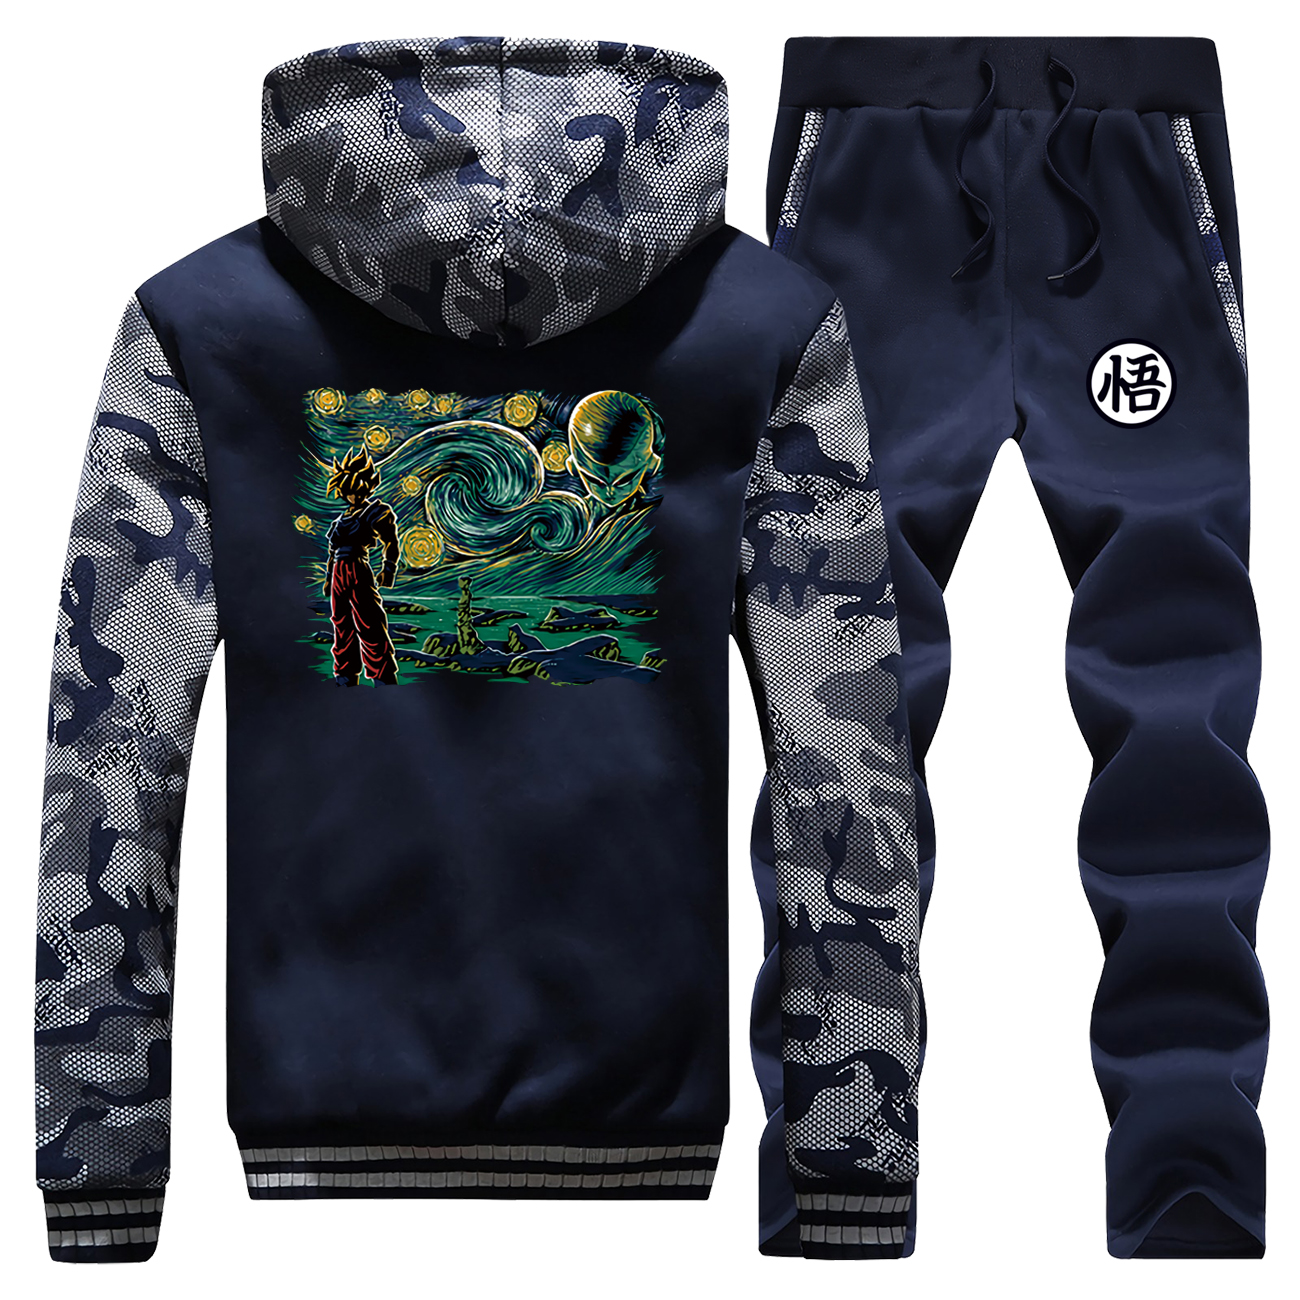 Japan Anime Vintage Thick Jacket Van Gogh's Dragon Ball Camo Male Set Set Men Warm Gym Suit 2019 Winter Fleece Pants Sweatshirts